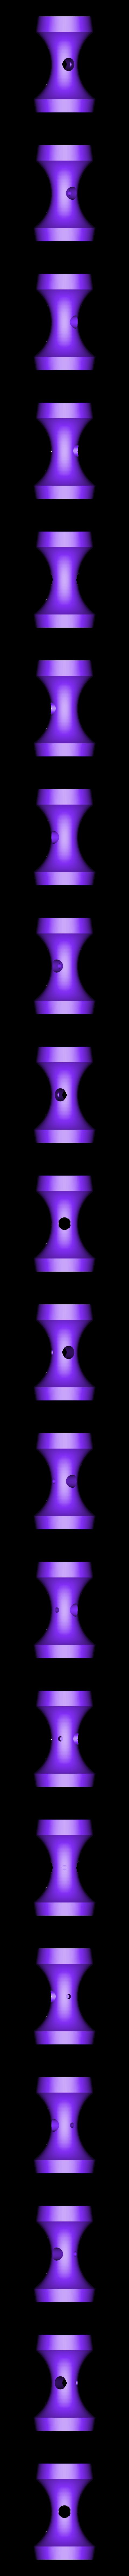 Kendama Cup.stl Download STL file Classic Kendama • 3D printing design, httpkoopa